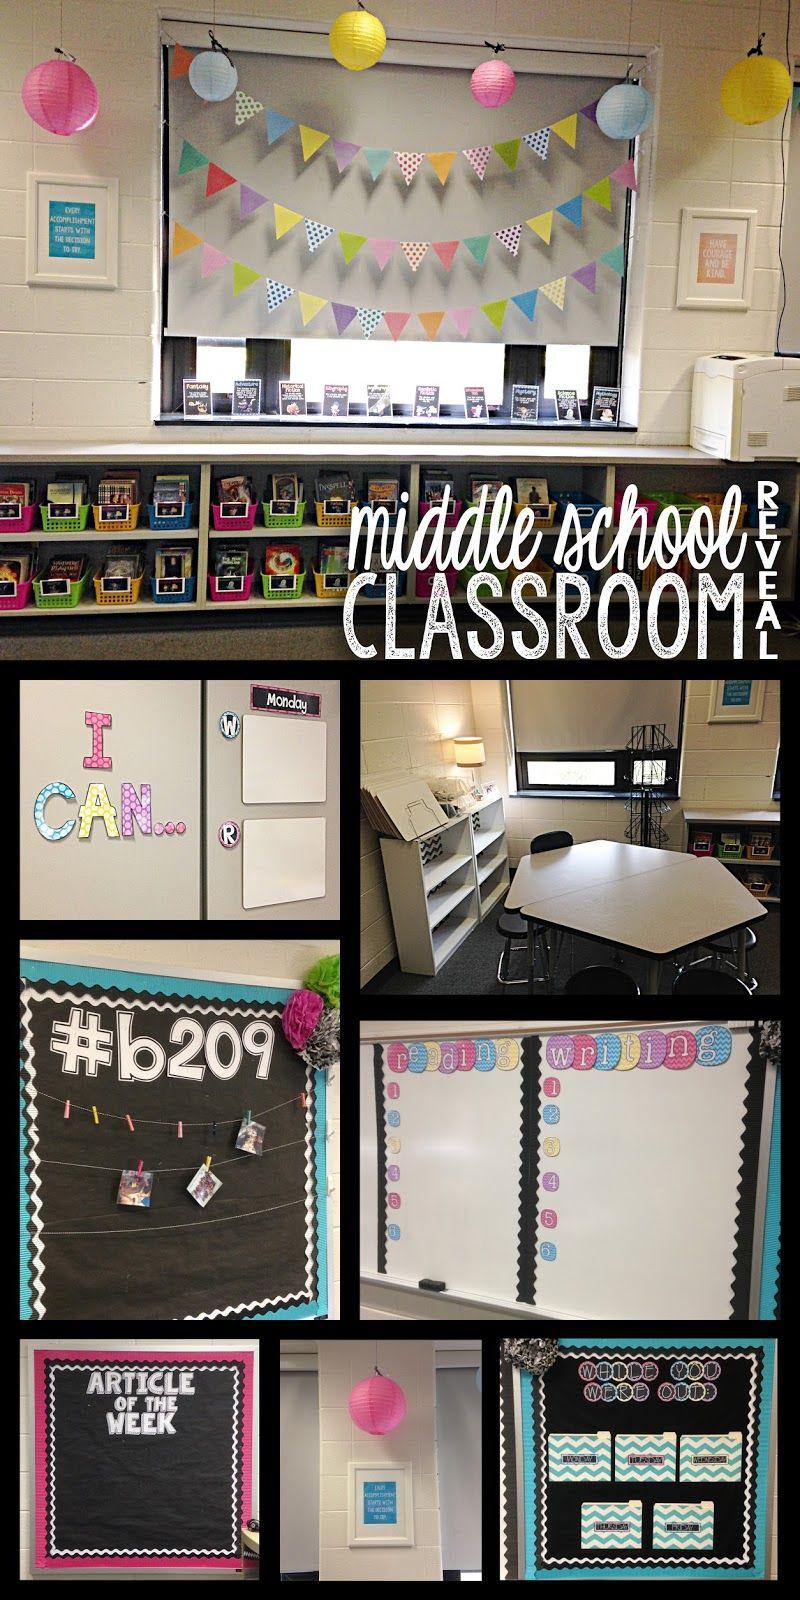 Middle School Classroom Decorating Ideas